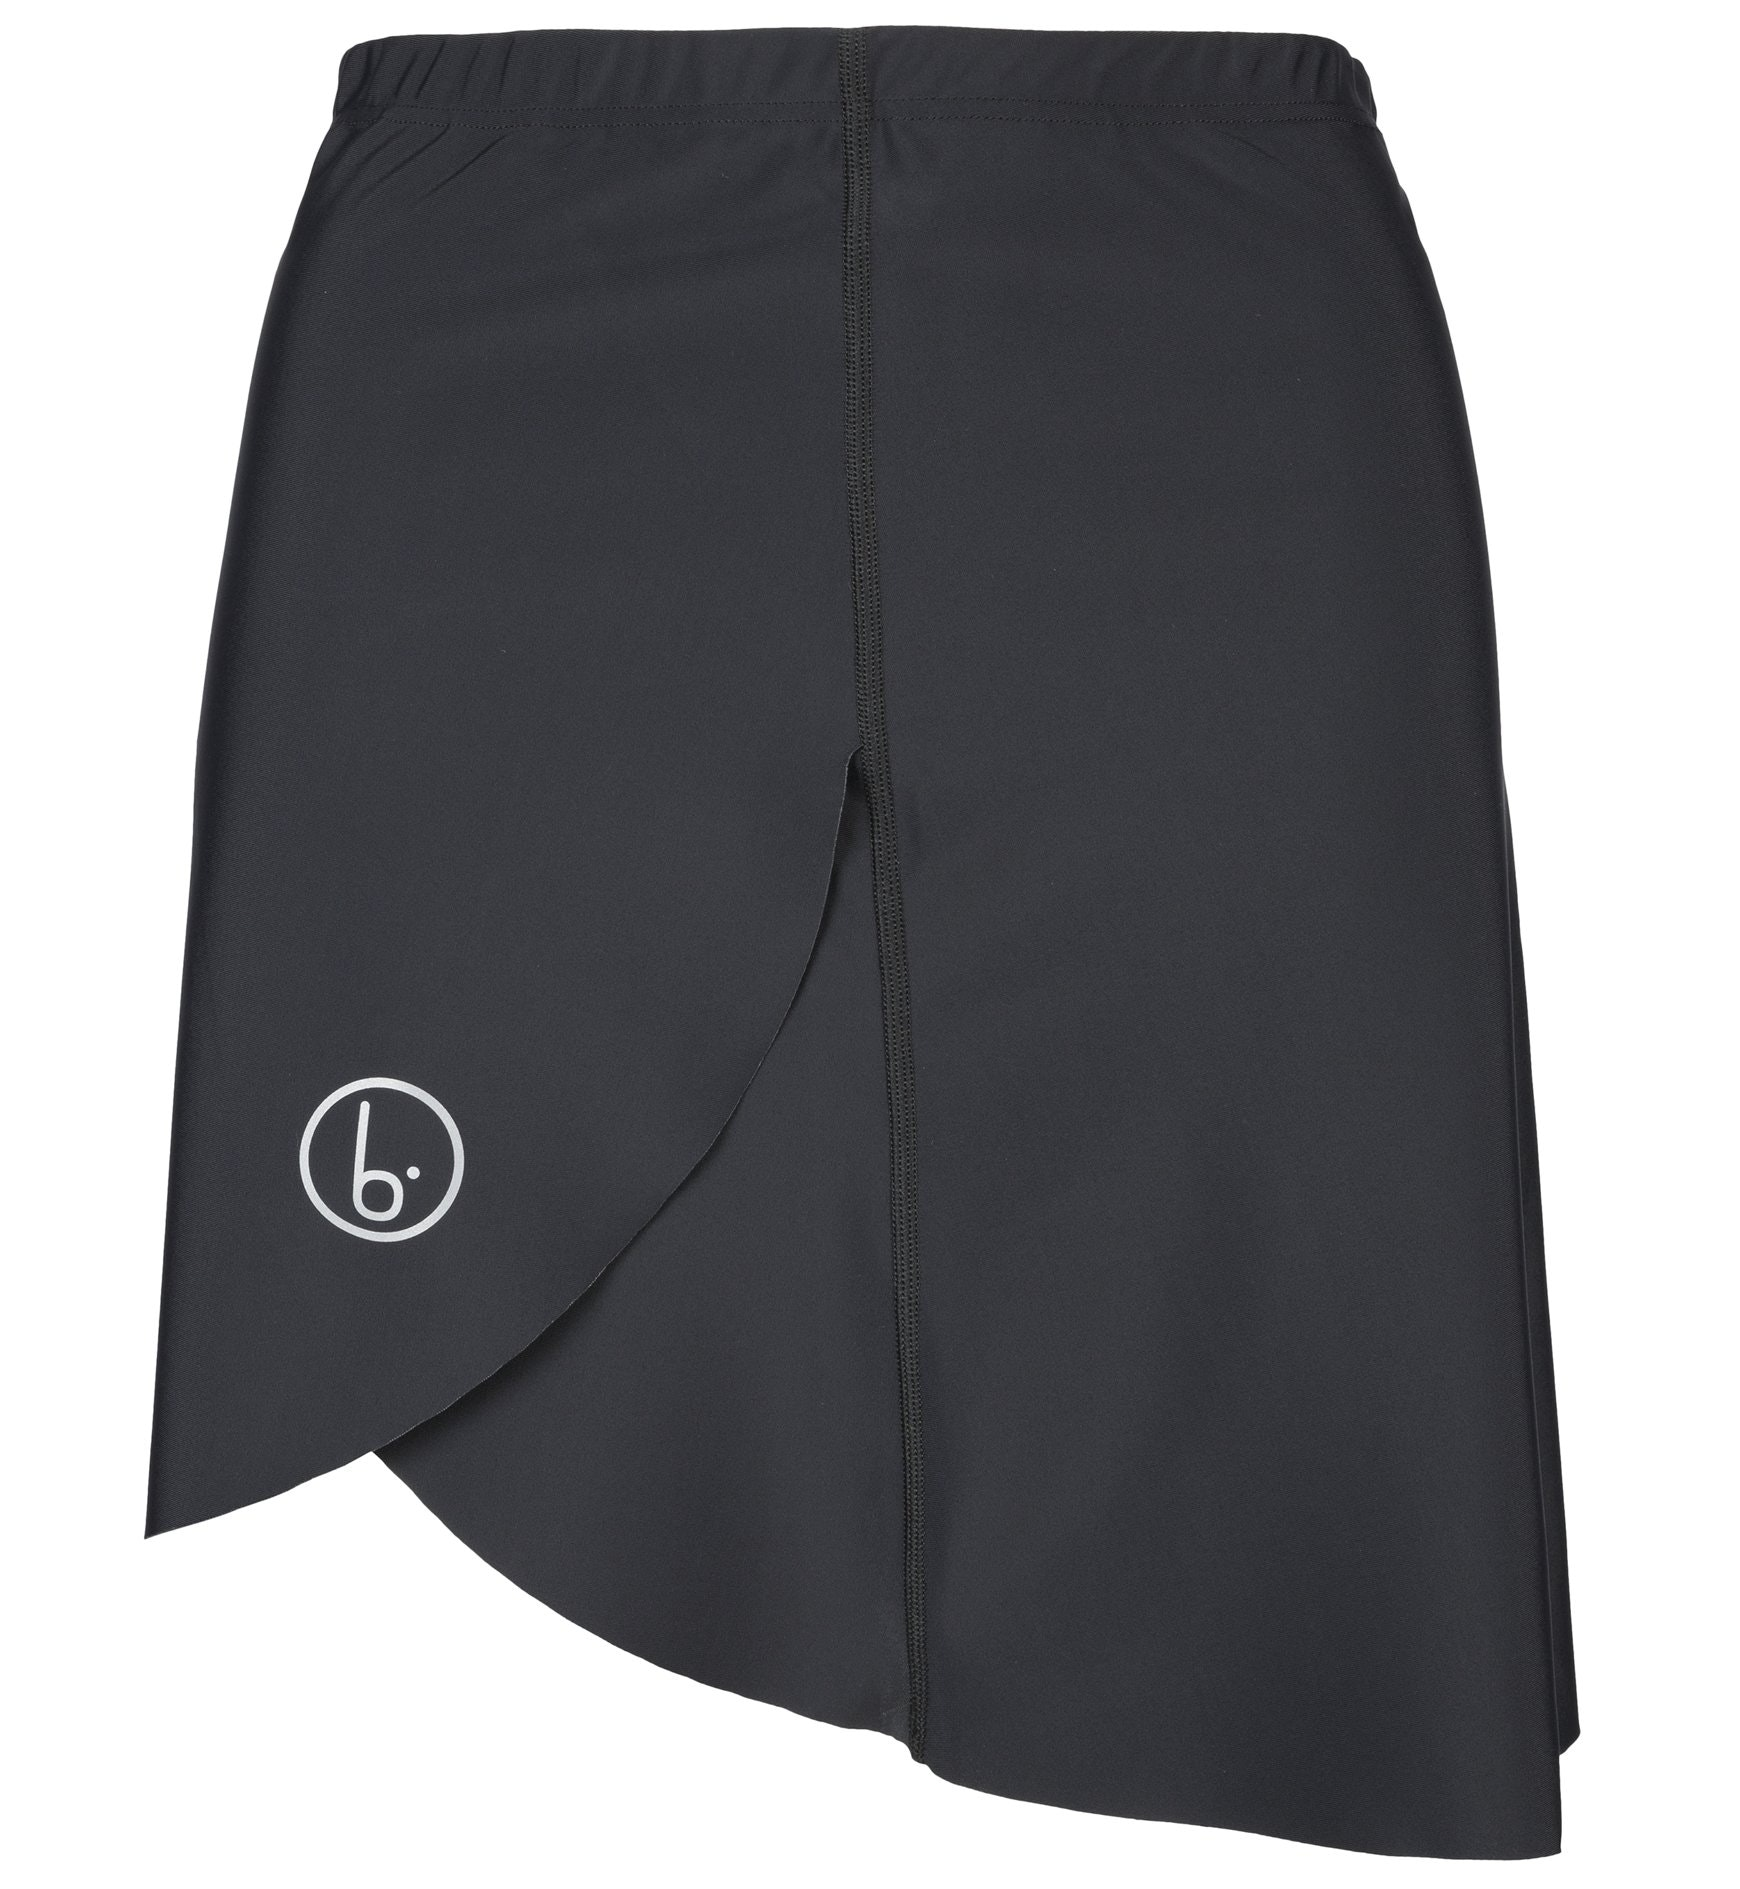 Biciclista The Black Skirt 2.0 - gonna bici - donna